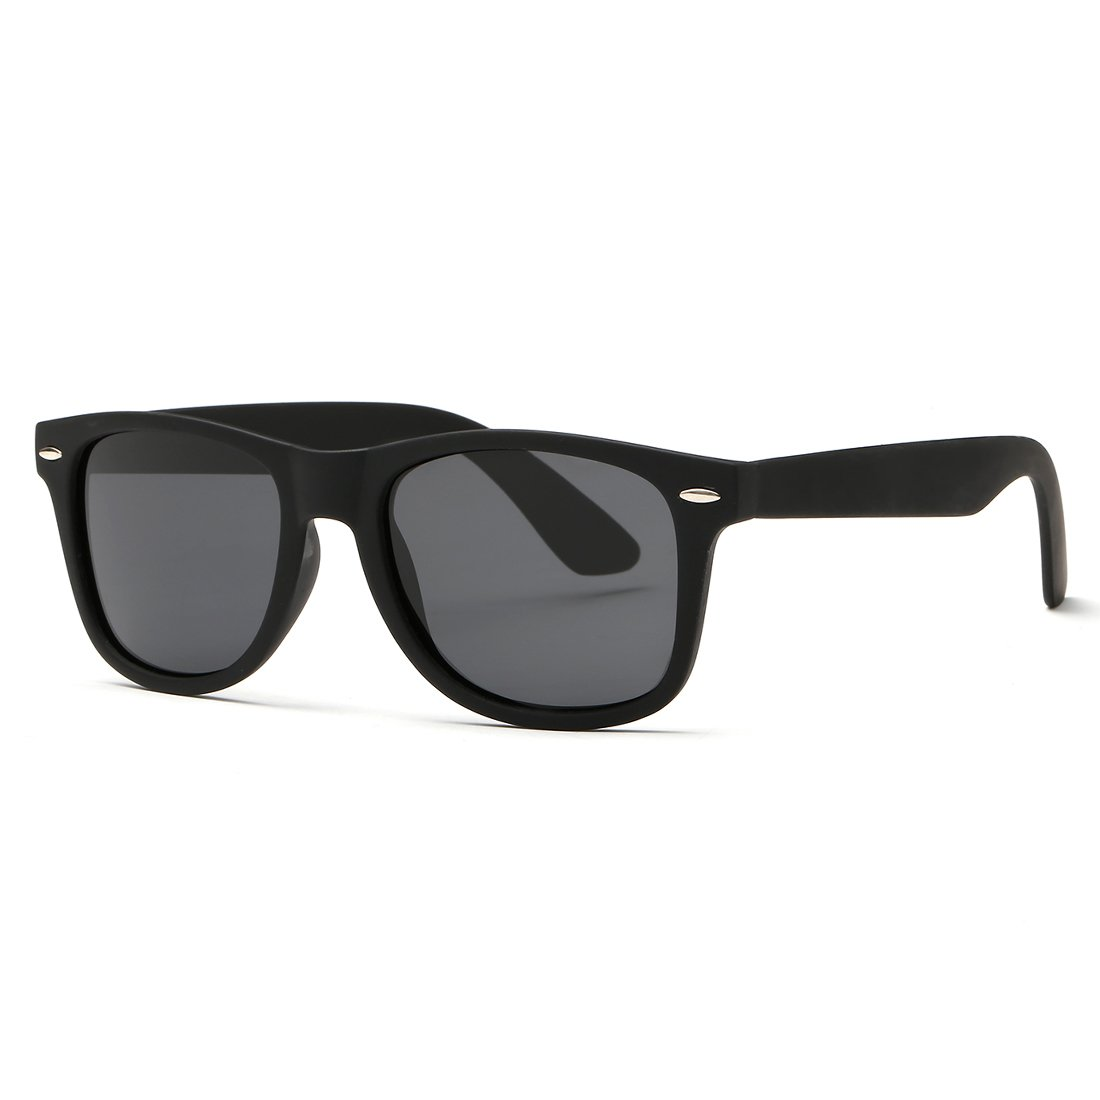 97afcf23a56 Kimorn Polarized Sunglasses Classic Unisex Horn Rimmed 80 s Retor Eyewear  AE0300 (Black